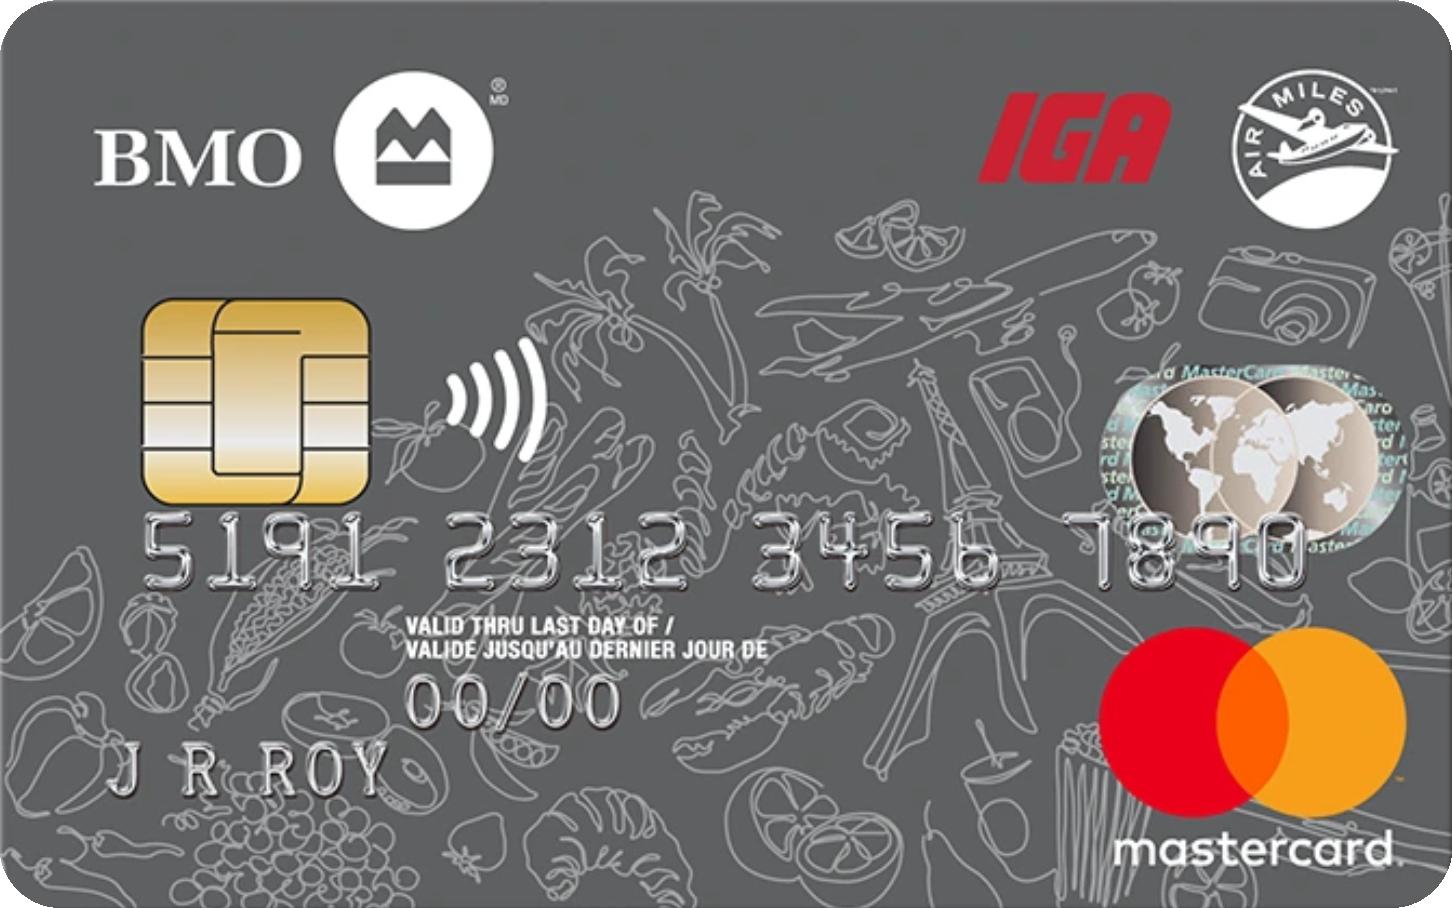 BMO® IGA AIR MILES® MasterCard® logo